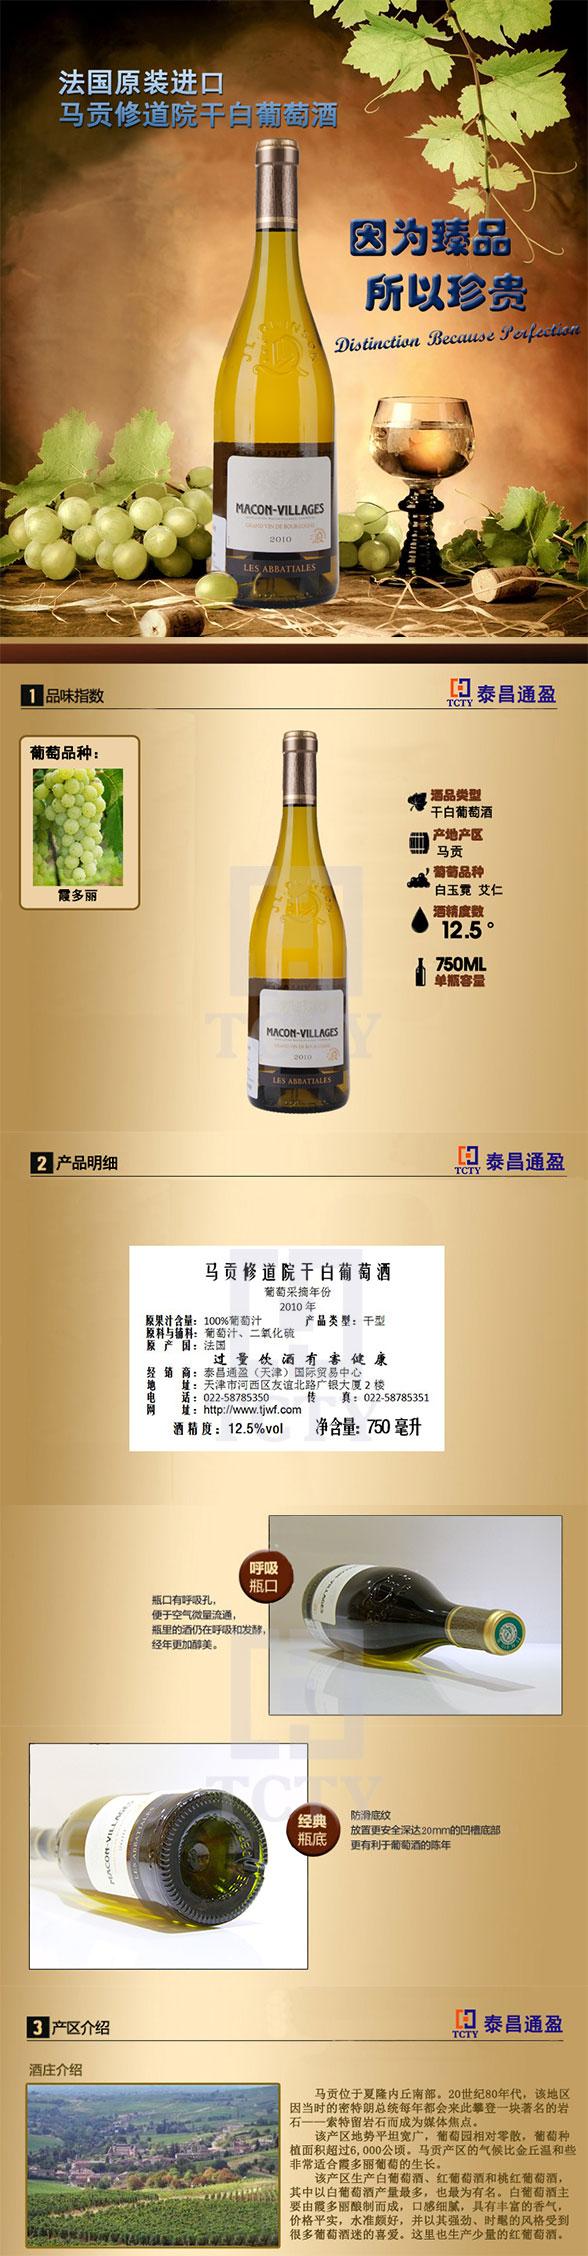 Abbatiales Macon-Villages马贡修道院干白葡萄酒